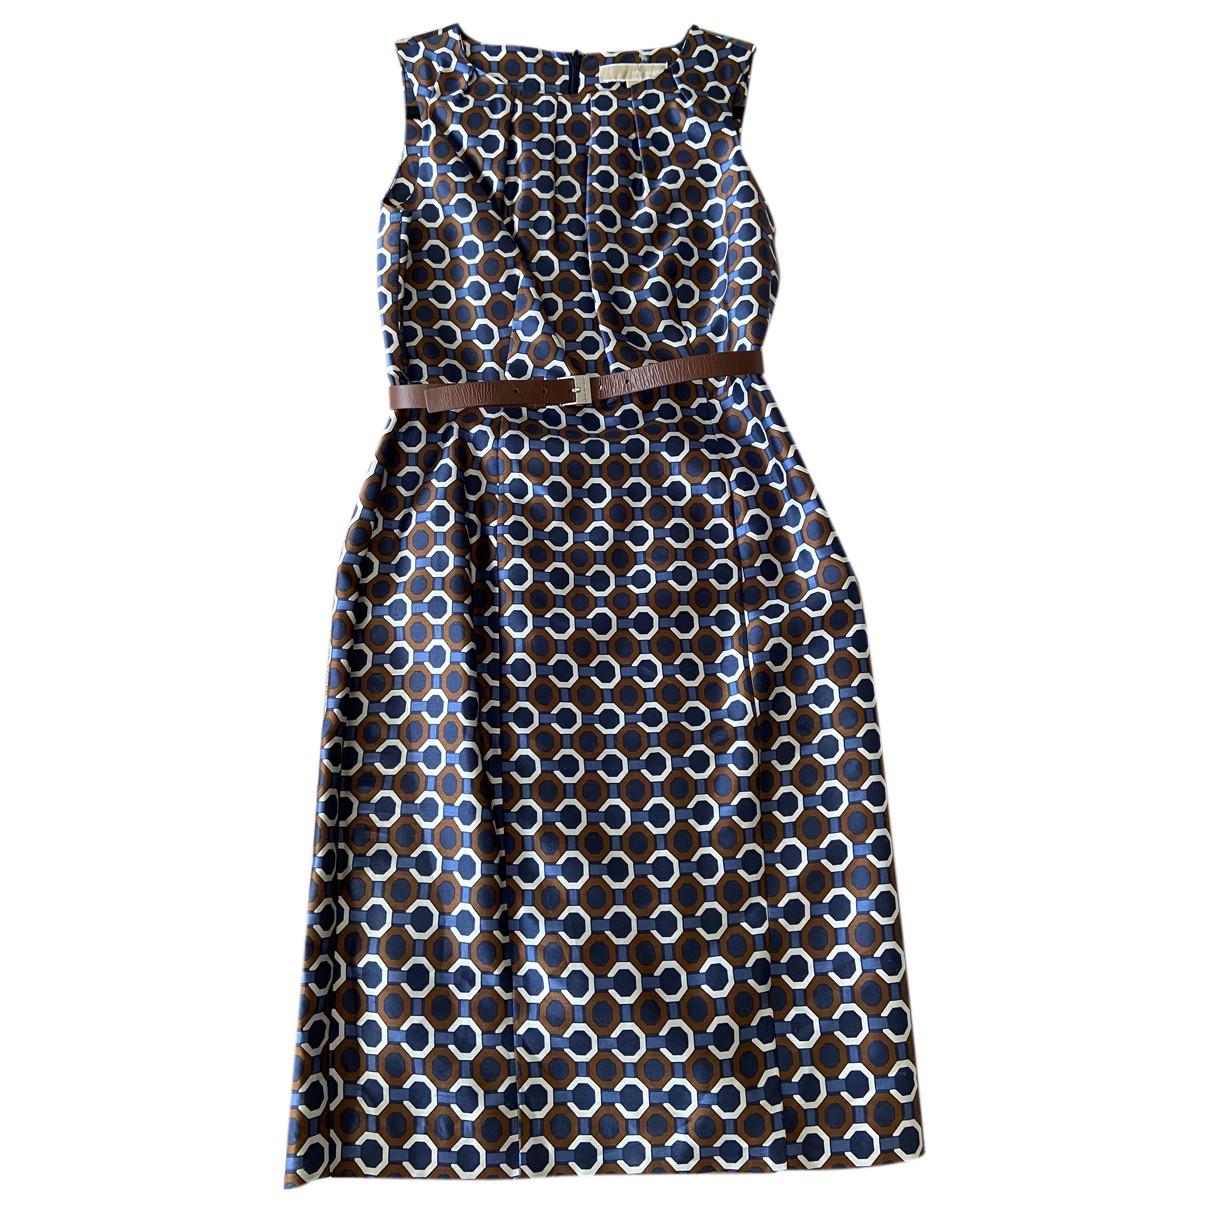 Michael Kors N Blue Silk dress for Women 2 US